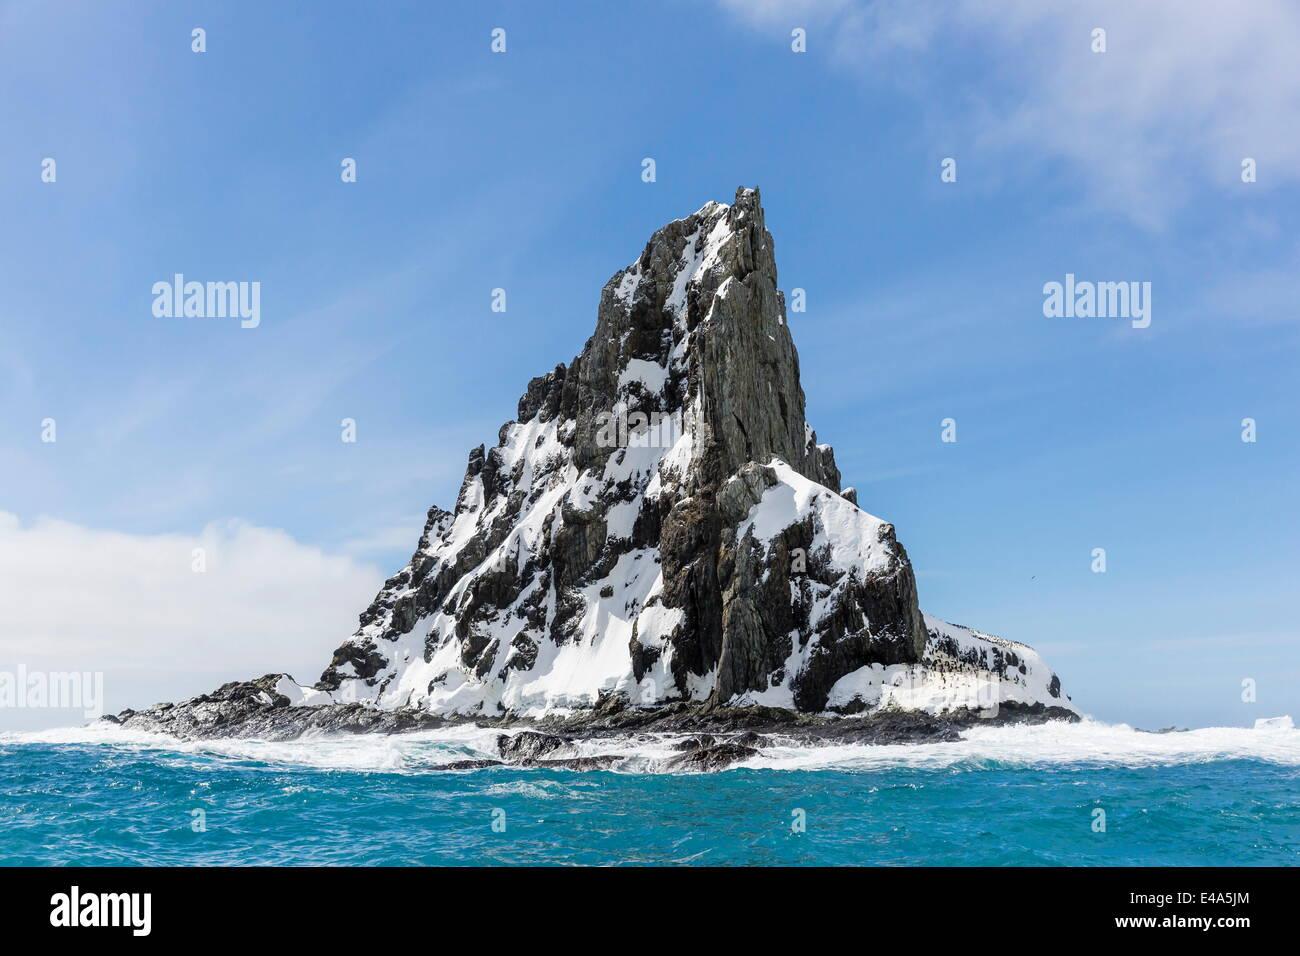 Point Wild, Elephant Island, South Shetland Islands, Antarctica, Polar Regions - Stock Image